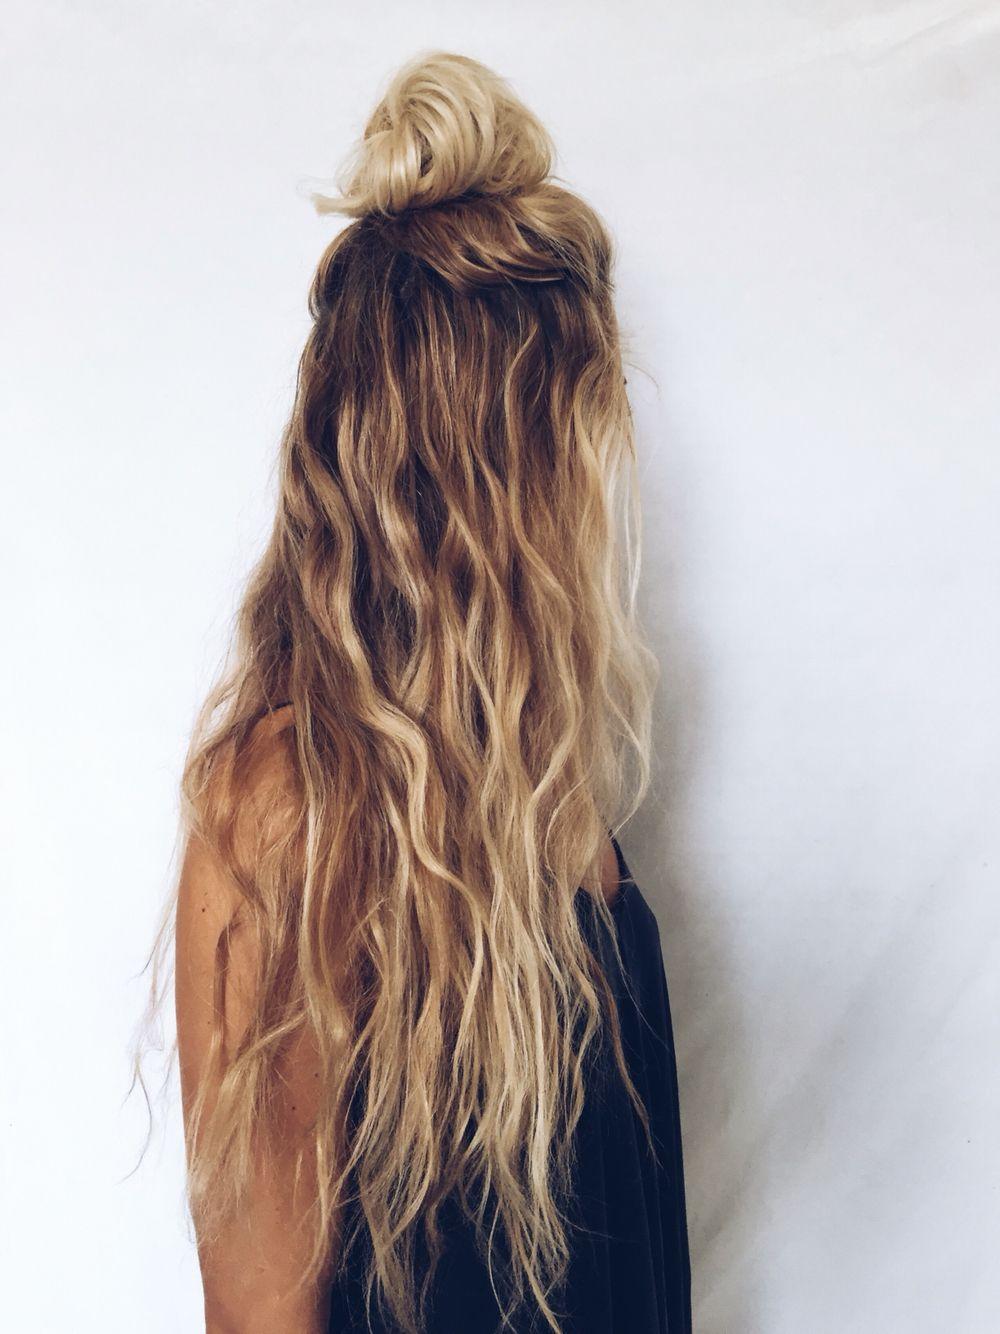 long hair, blonde, curly wavy, natural kcdoubletake